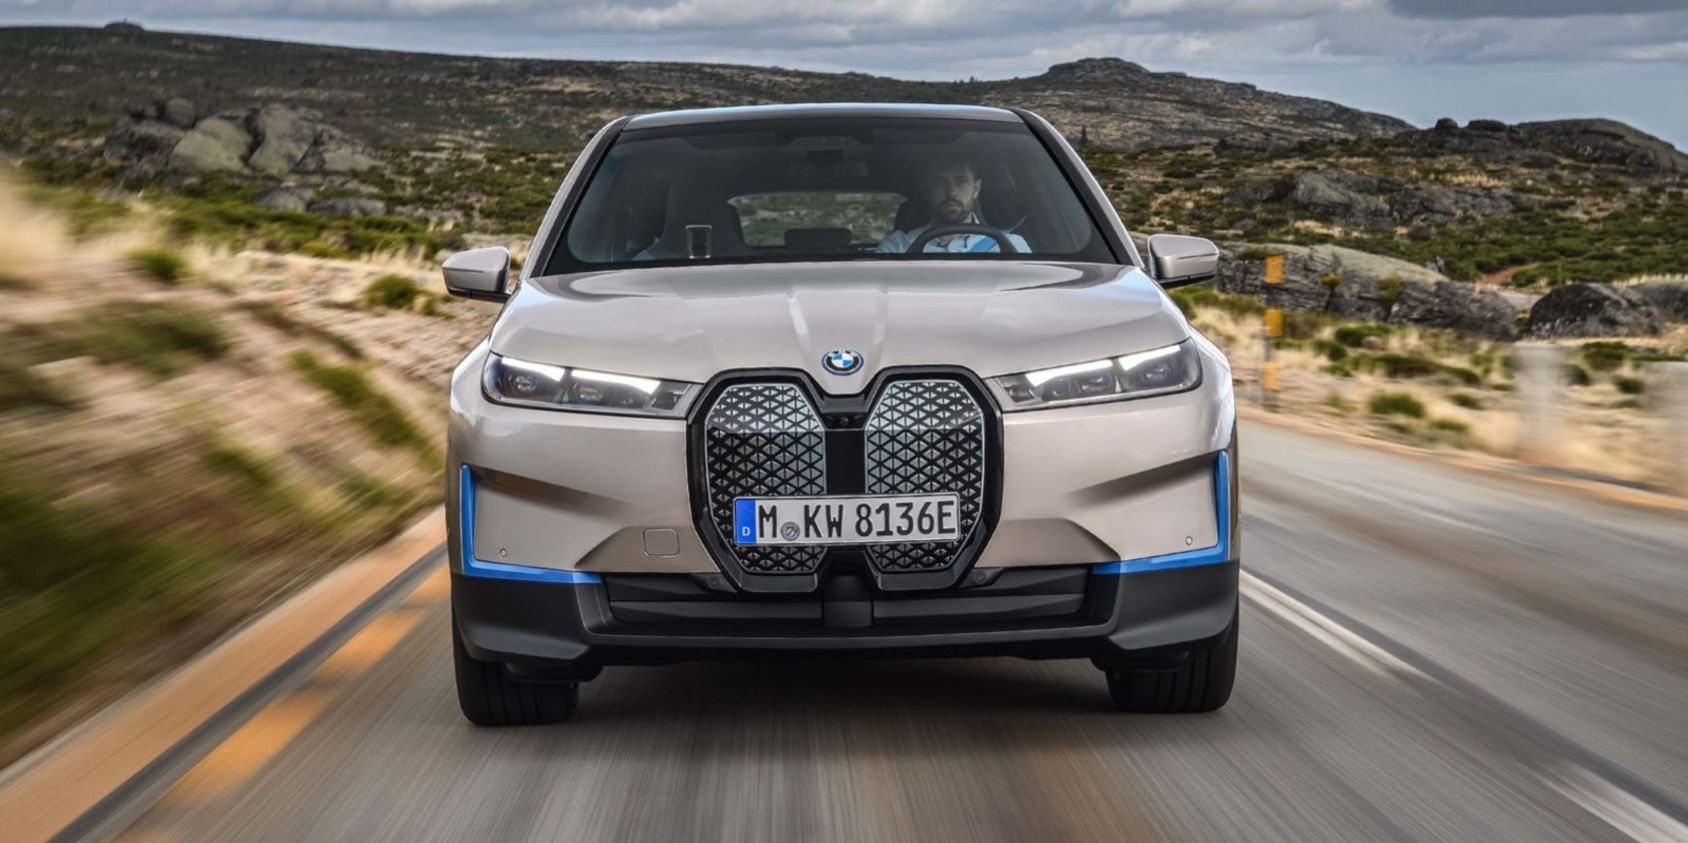 BMW:s svar på kritik kring iX: